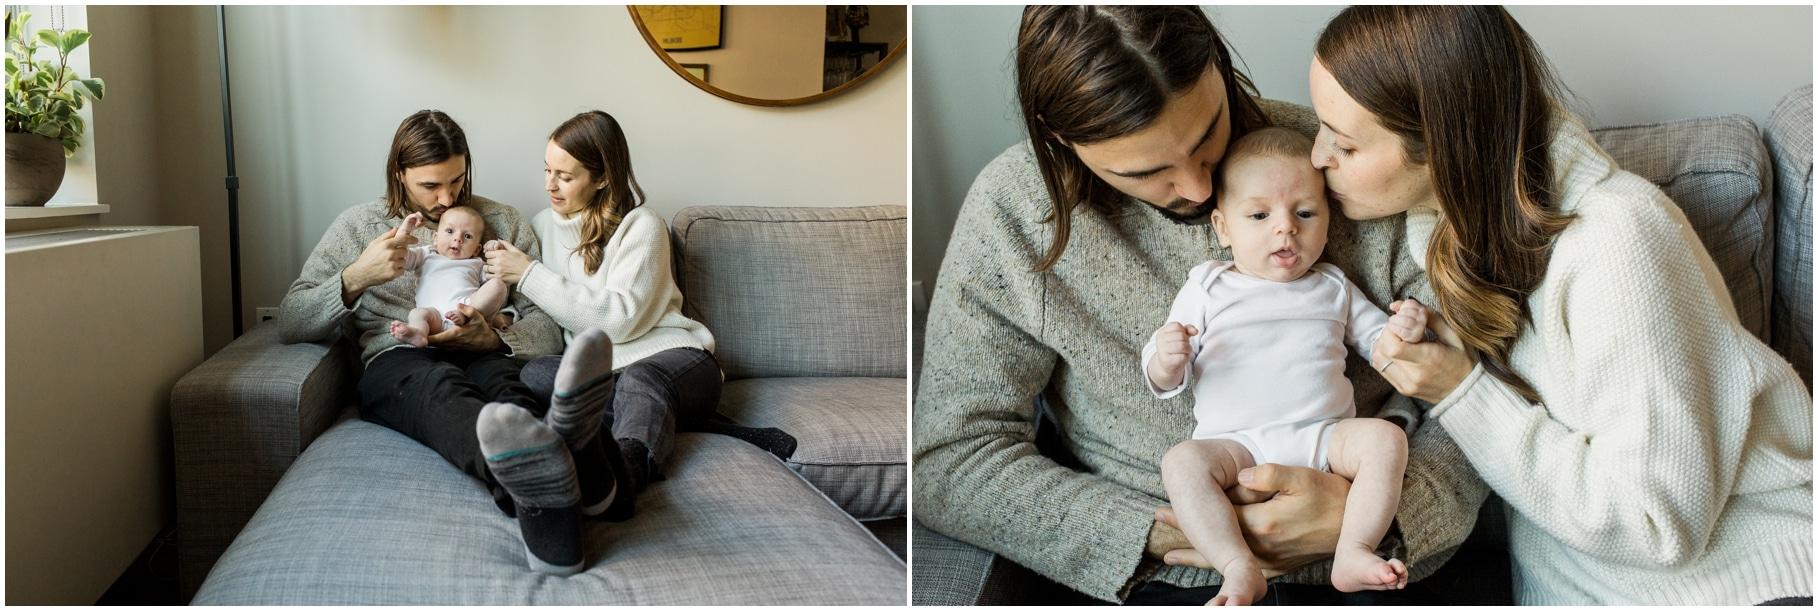 adam lowe photography, family session, nyc, brooklyn, photographer, photography, style, baby, lifestyle, Columbus, Ohio, Williamsburg,